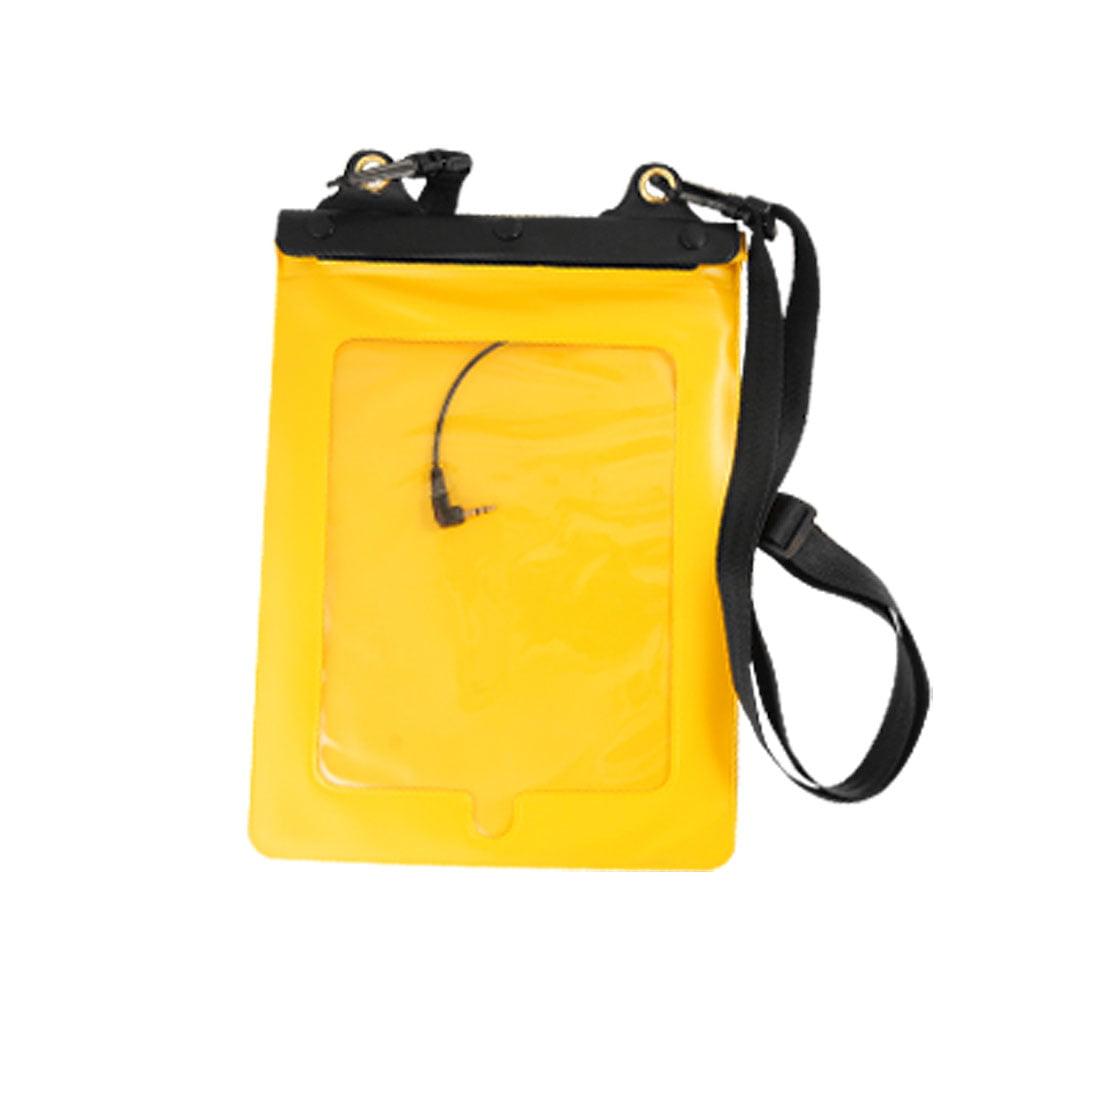 Unique Bargains Unique Bargains Yellow Water Resistant Bag w Earphone + Strap for HP TOuchpad Tablet